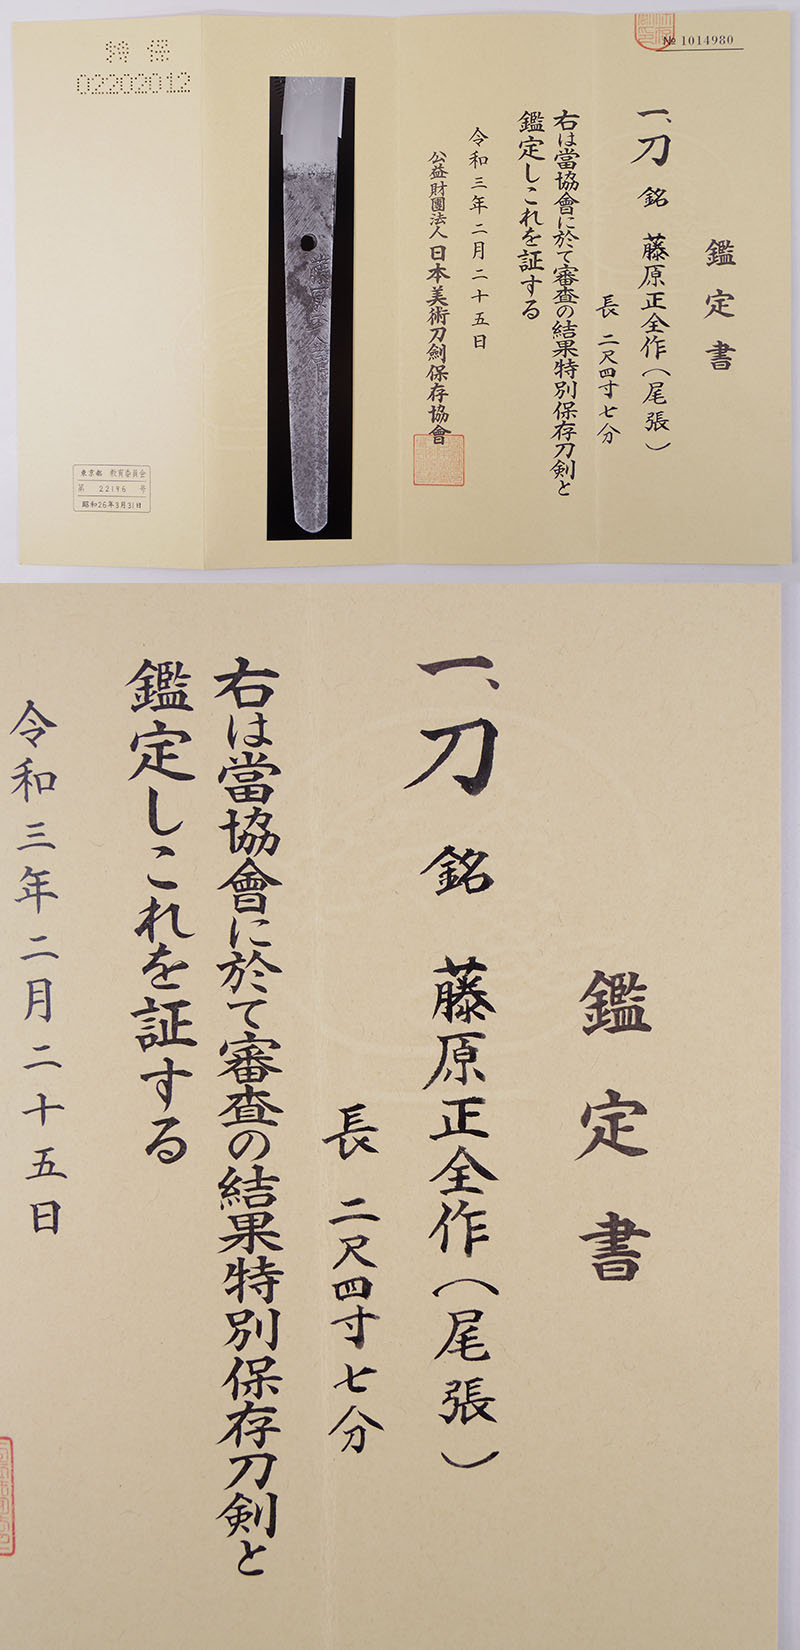 刀 藤原正全作(尾張) (業物) Picture of Certificate